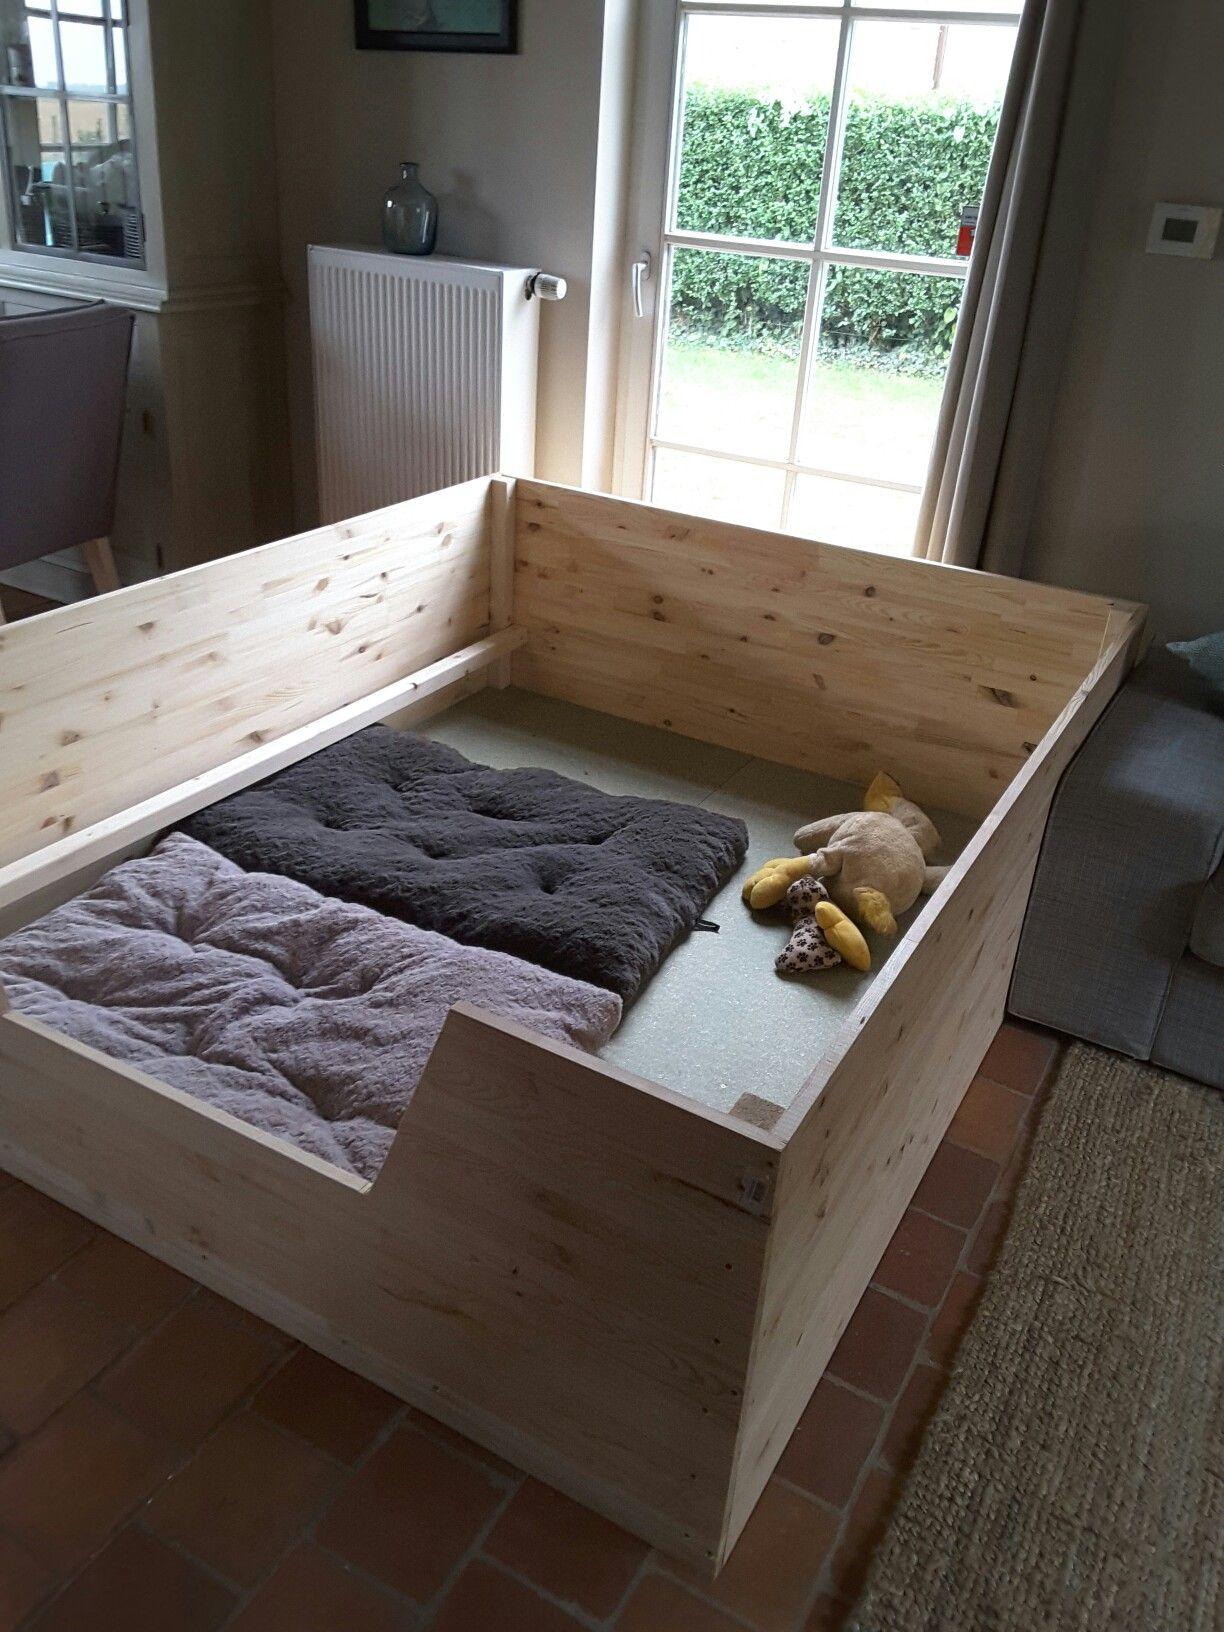 Whelping box puppies Pinterest Whelping box, Dog and